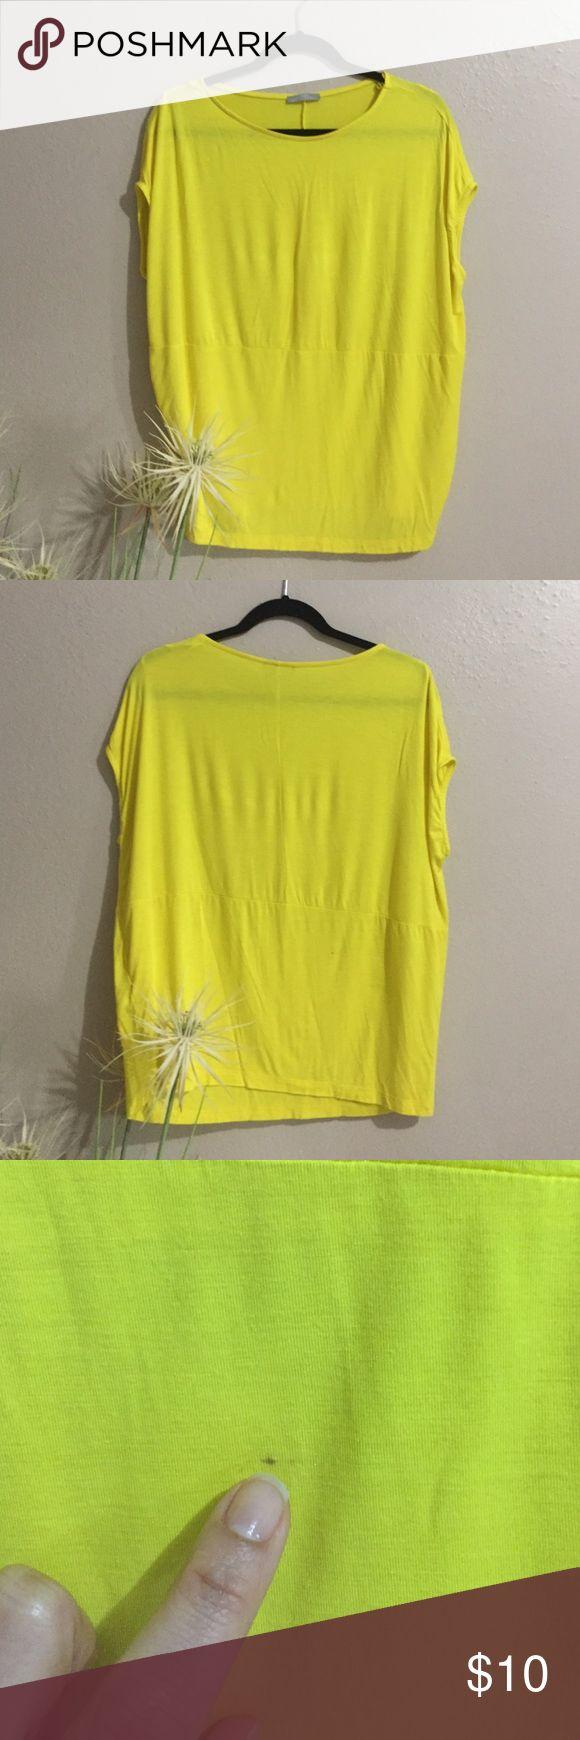 Zara Collection T-shirt Great condition T-shirt in neon yellow, short sleeve. Zara Tops Tees - Short Sleeve